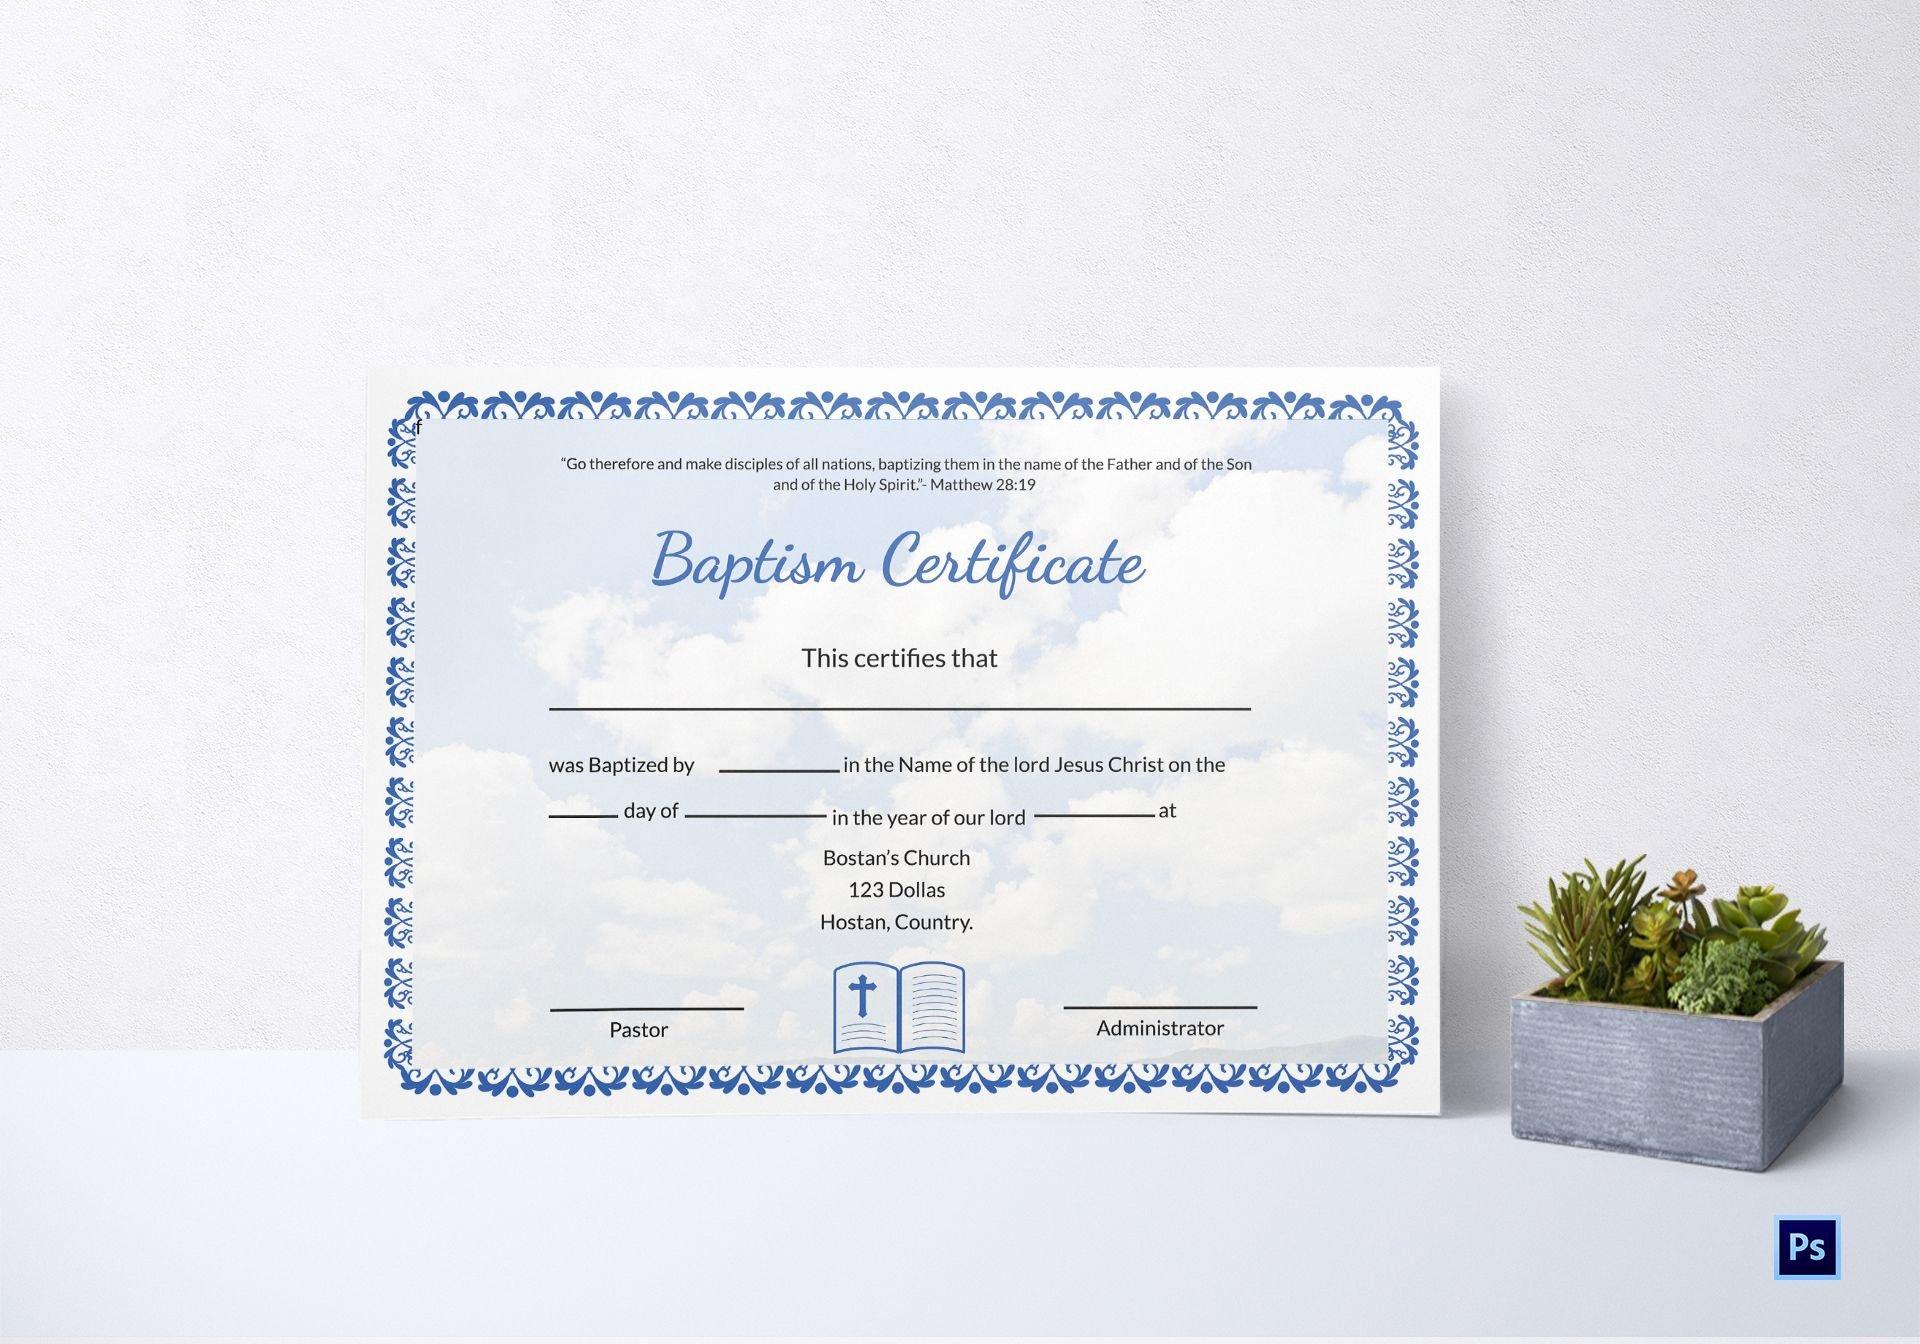 Editable Baptism Certificate In Word Beautiful Editable Baptism Certificate Template In Adobe Shop